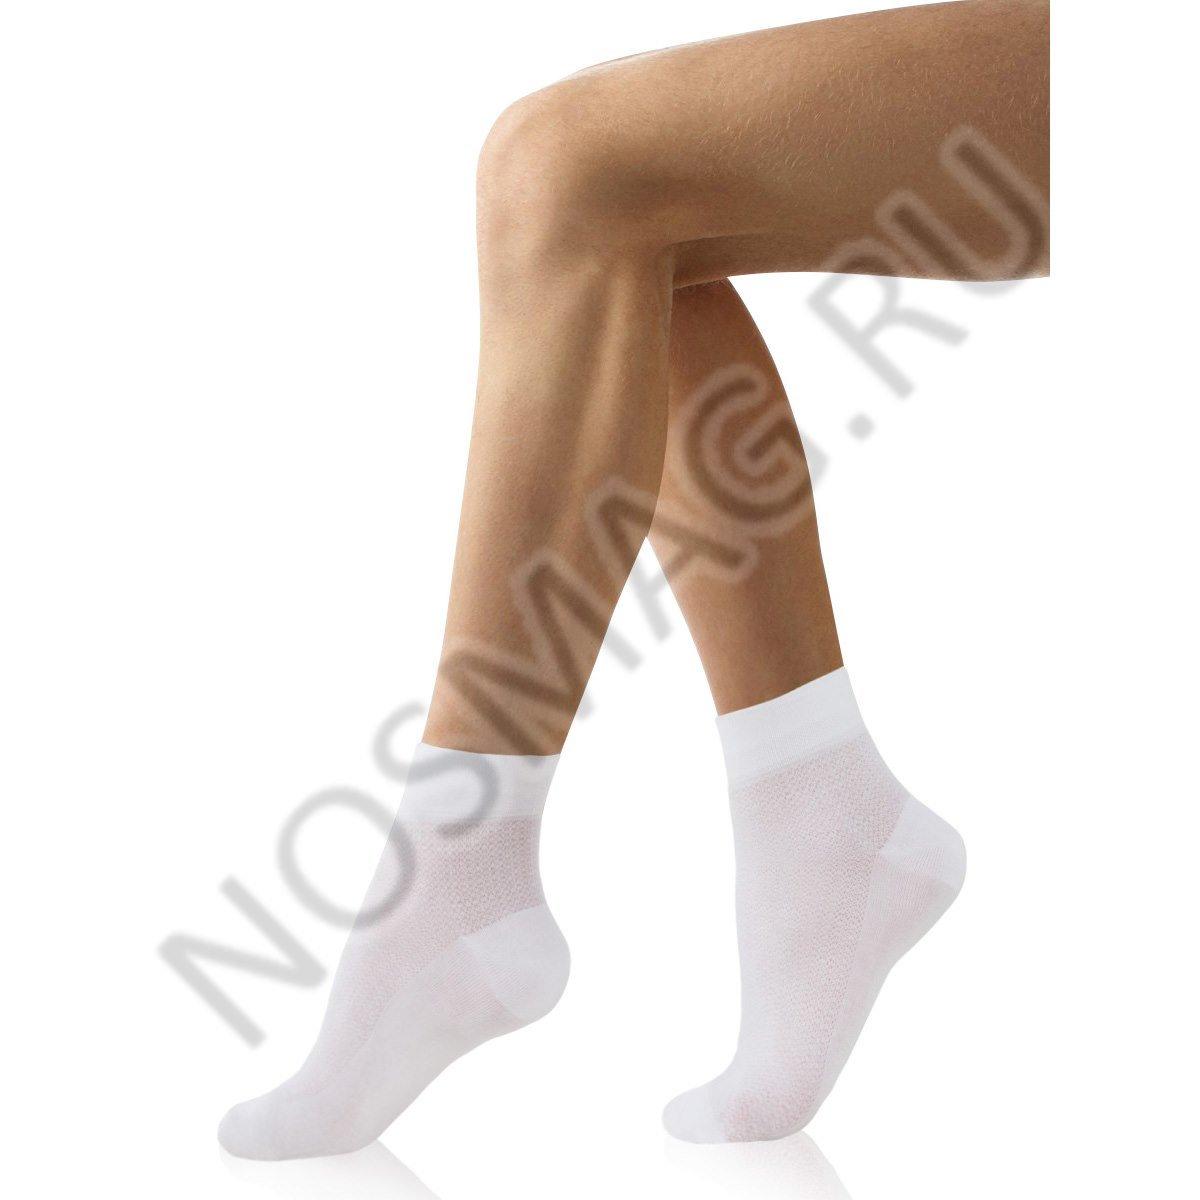 Носки мужские хлопковые Charmante белые